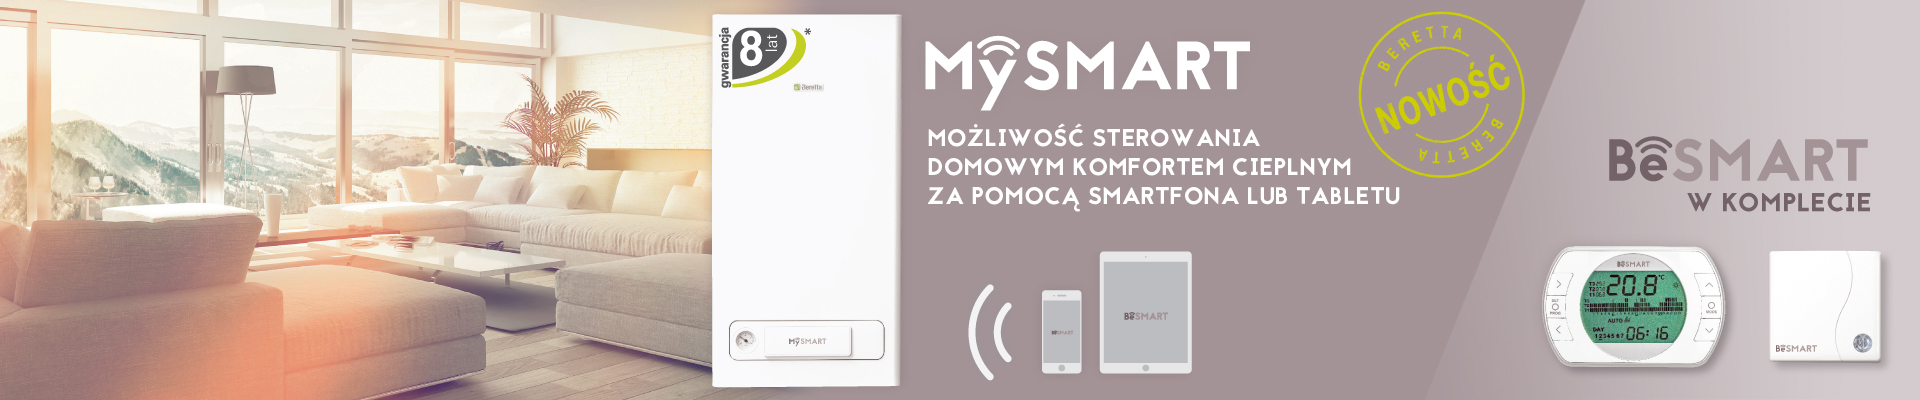 Slider_MySmart